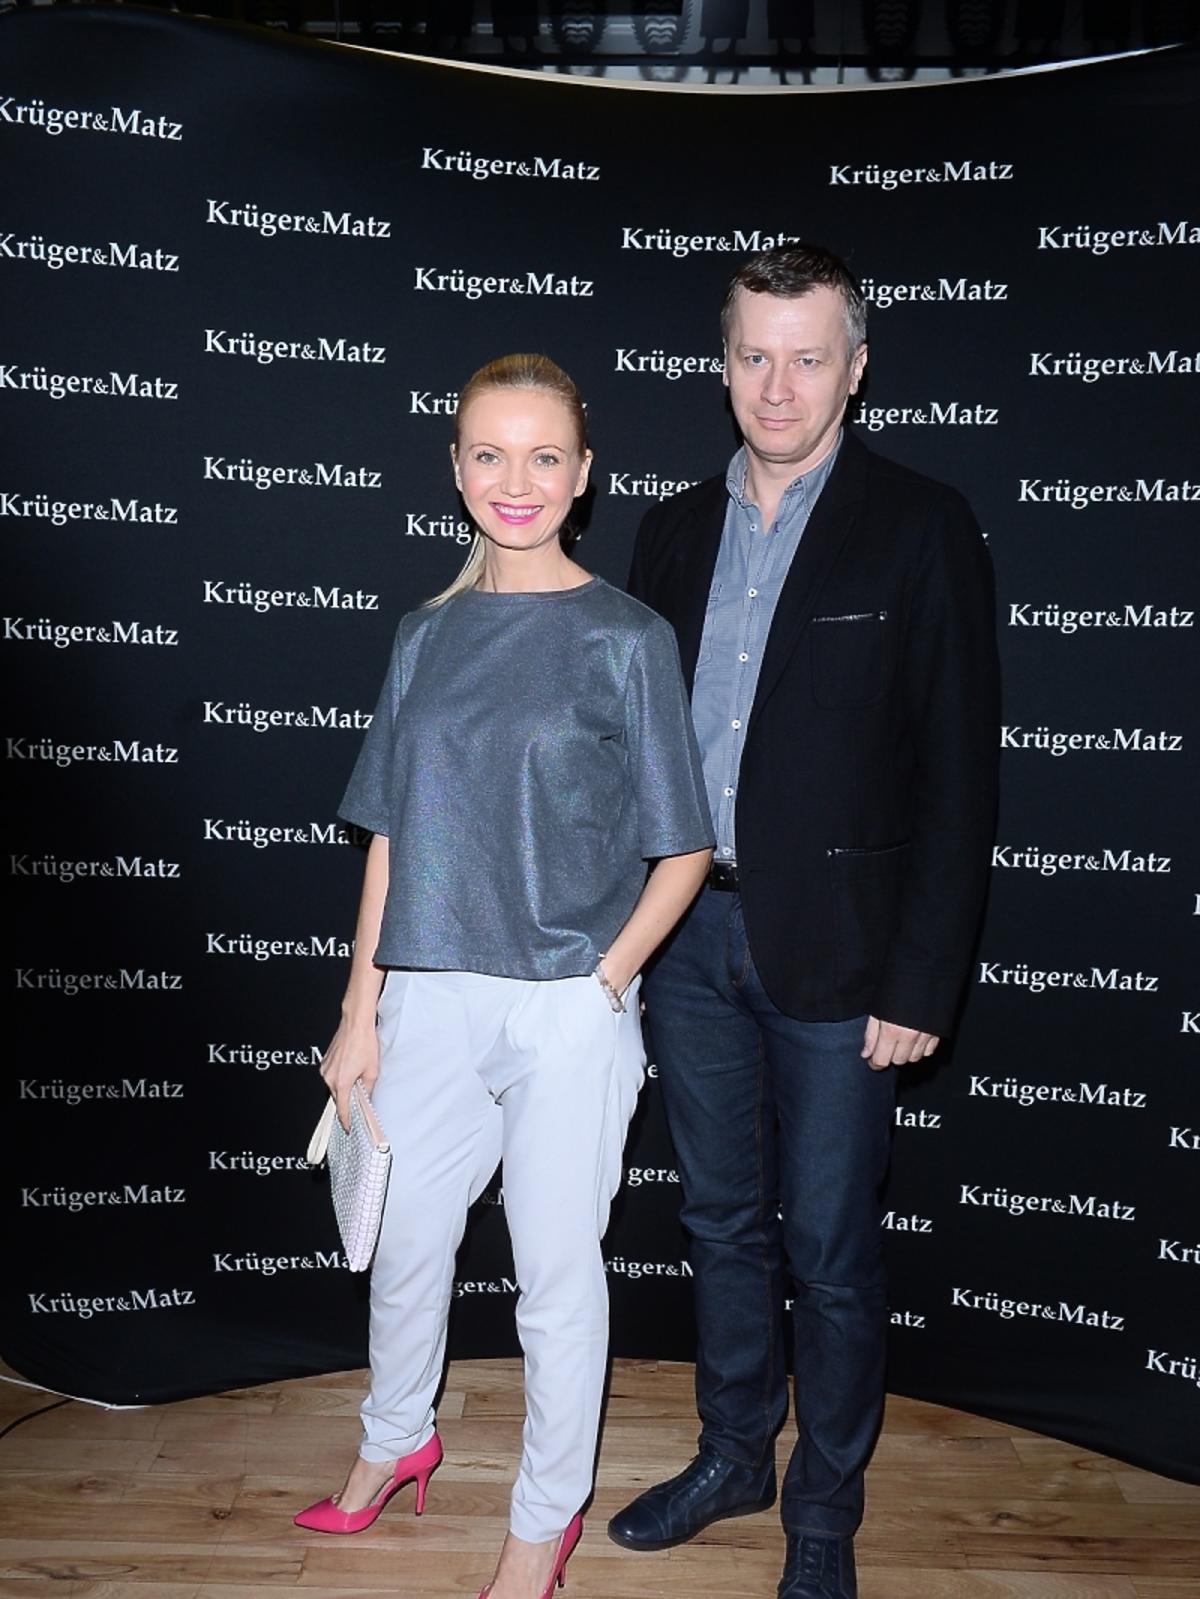 Olga Borys i Wojciech Majchrzak o na imprezie marki Kruger&Matz